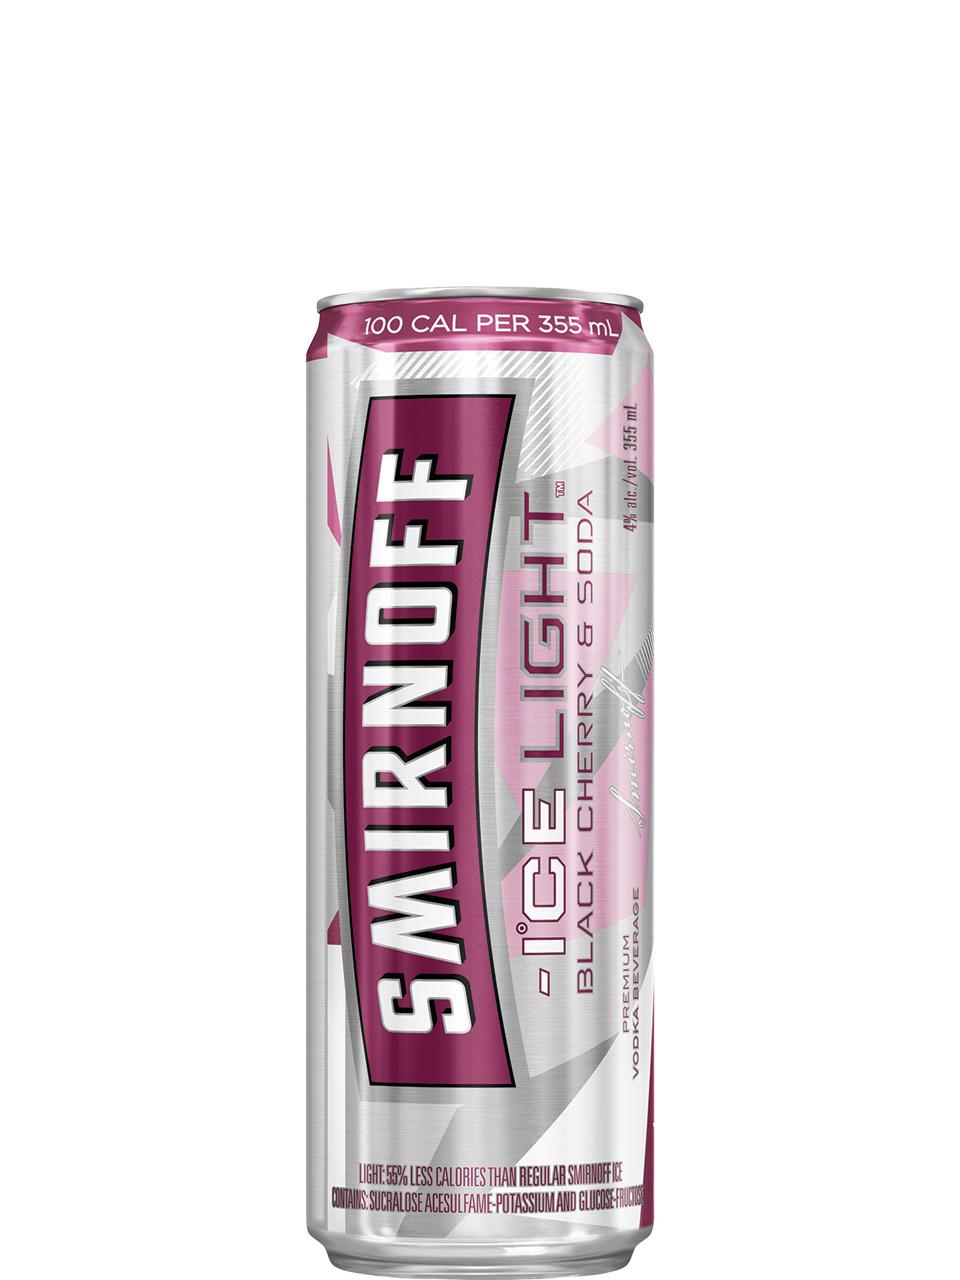 Smirnoff Ice Light Black Cherry & Soda 4 Pack Cans